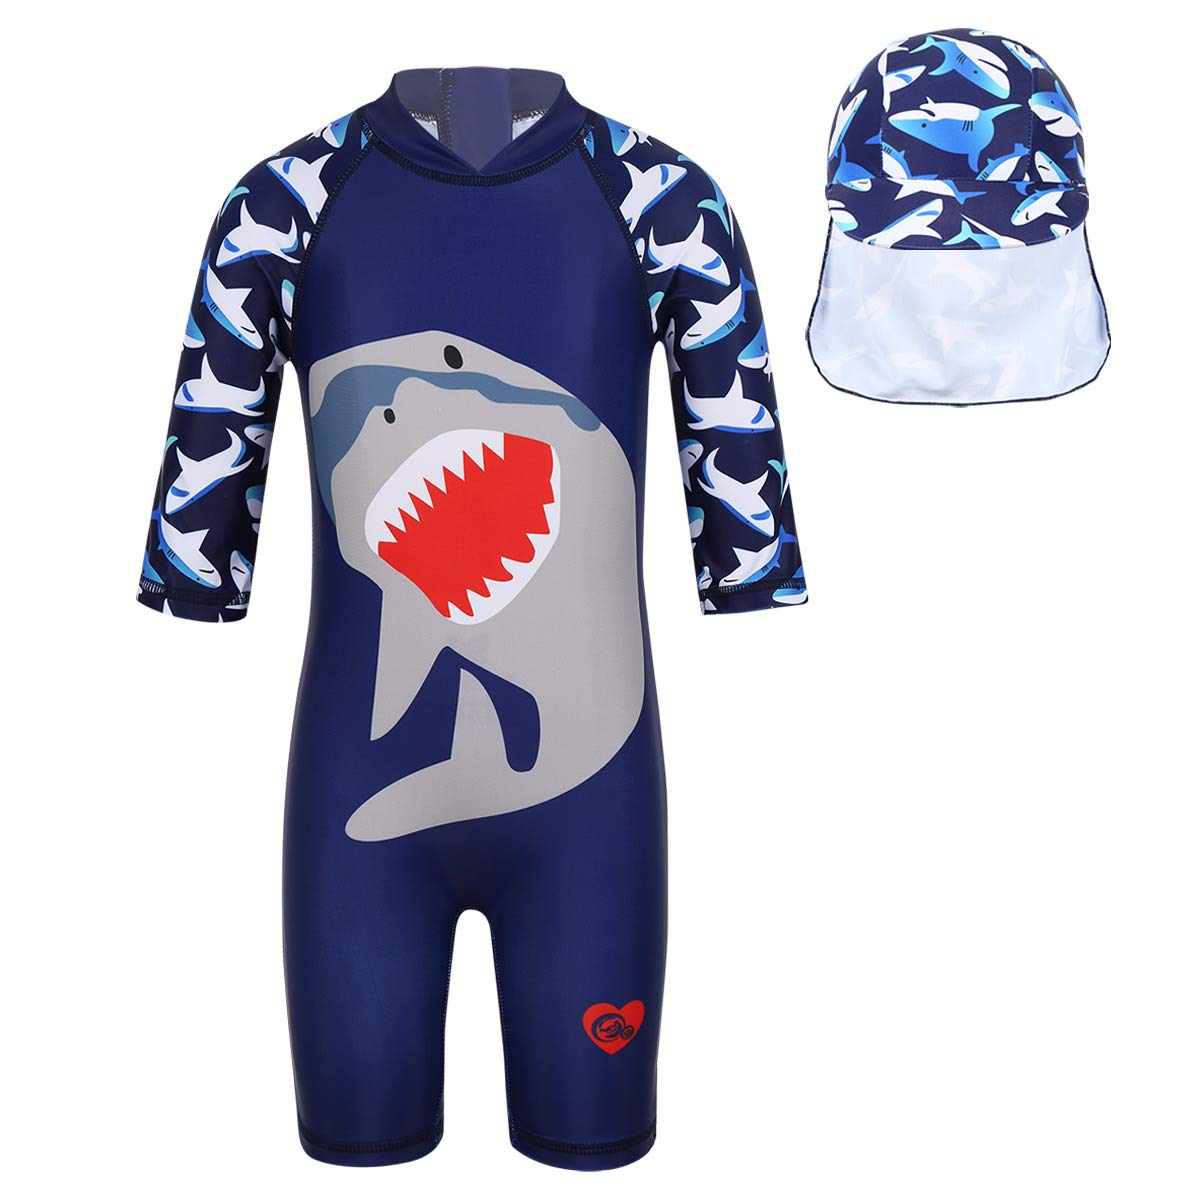 iEFiEL Kids Boy Girl Swimsuit One Piece Striped Surfing Suits Beach Swimwear Rash Guard